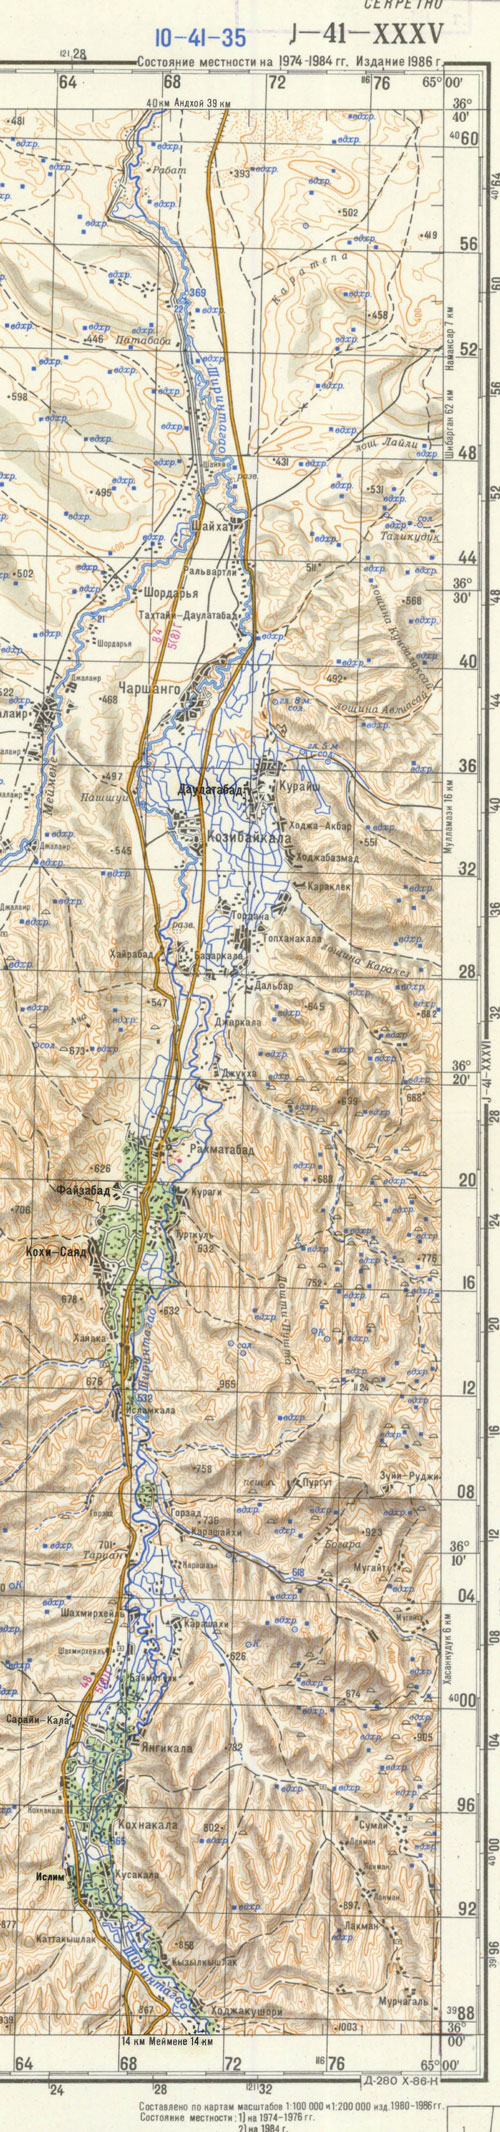 http://mmg-kaisar.ru/maps/fayzabad.jpg